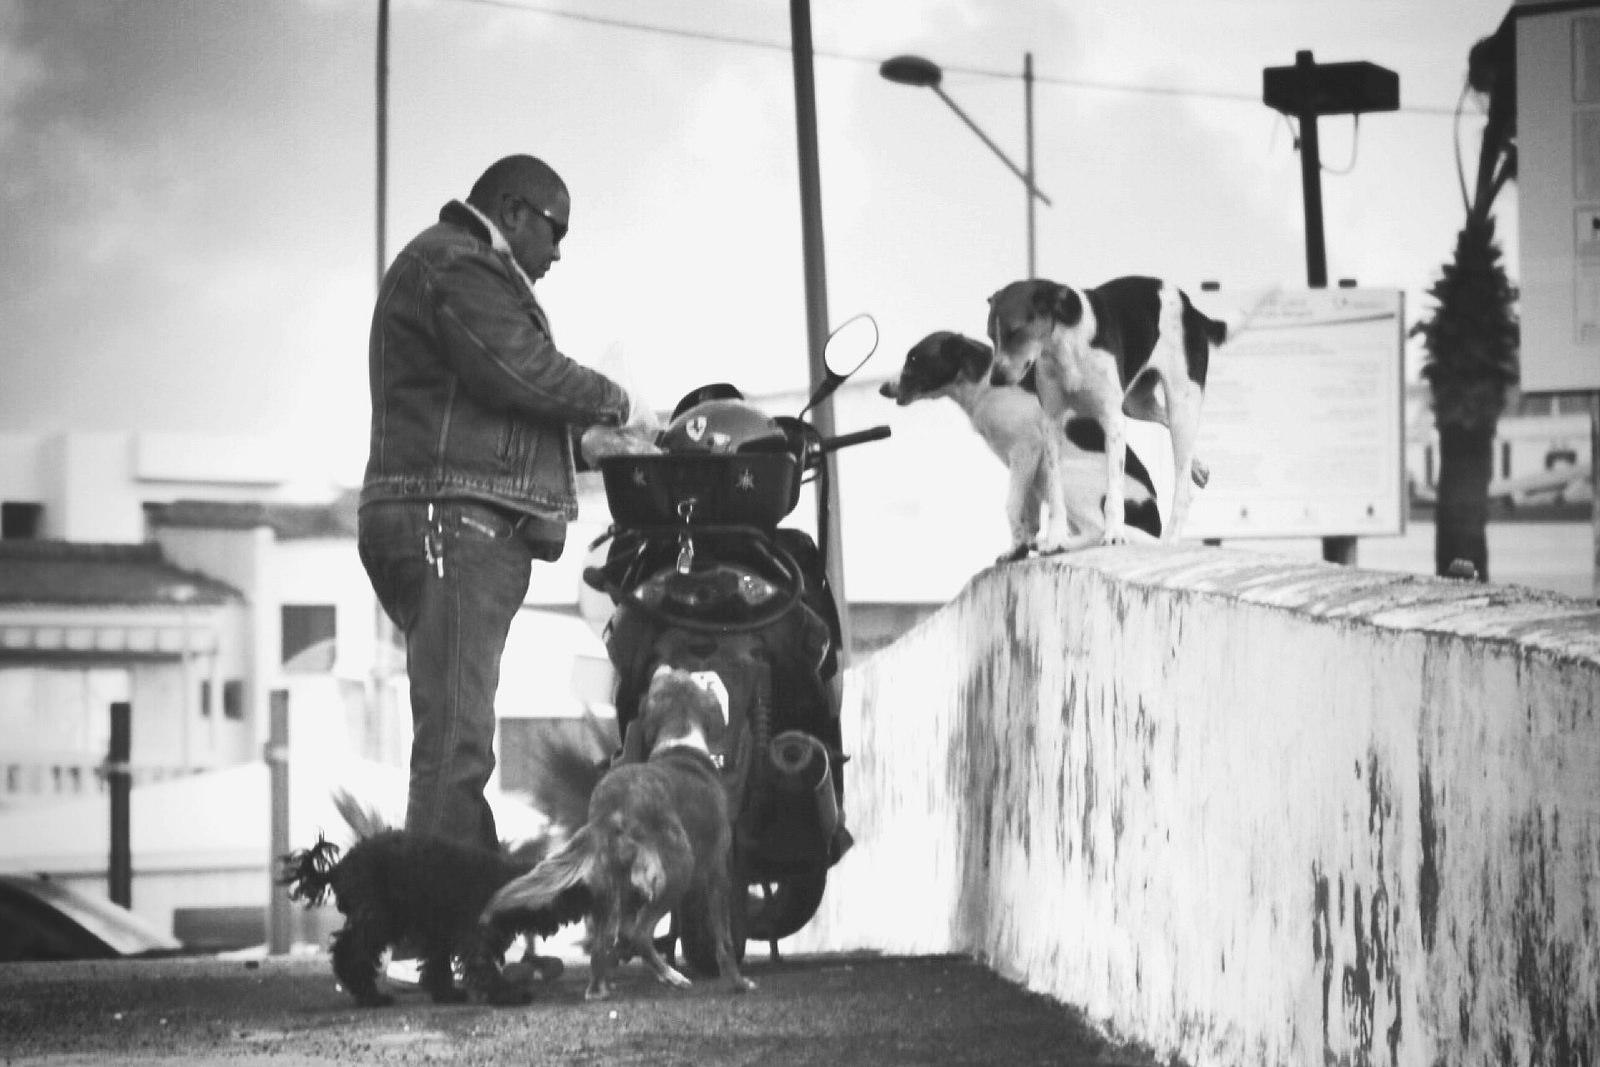 Photo of a man demonstrating generosity by feeding street dogs